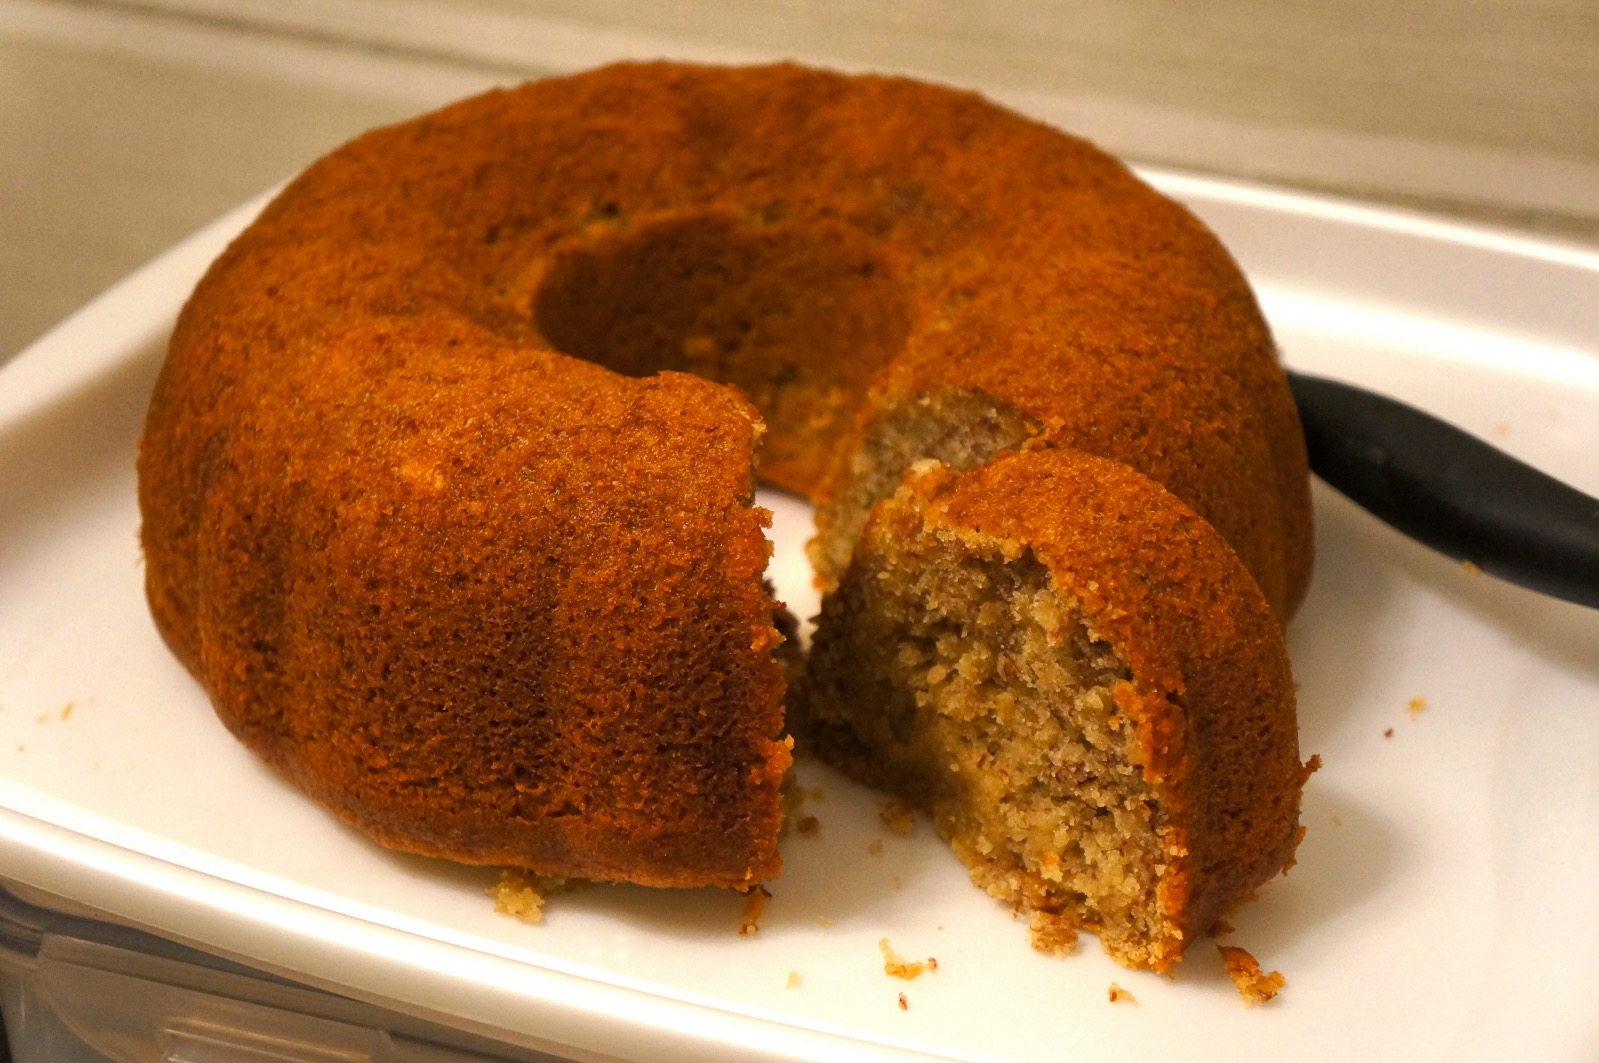 Banana Cake Recipe In Urdu Video: Sweet Sunday: Surprise Banana Cake [RECIPE]